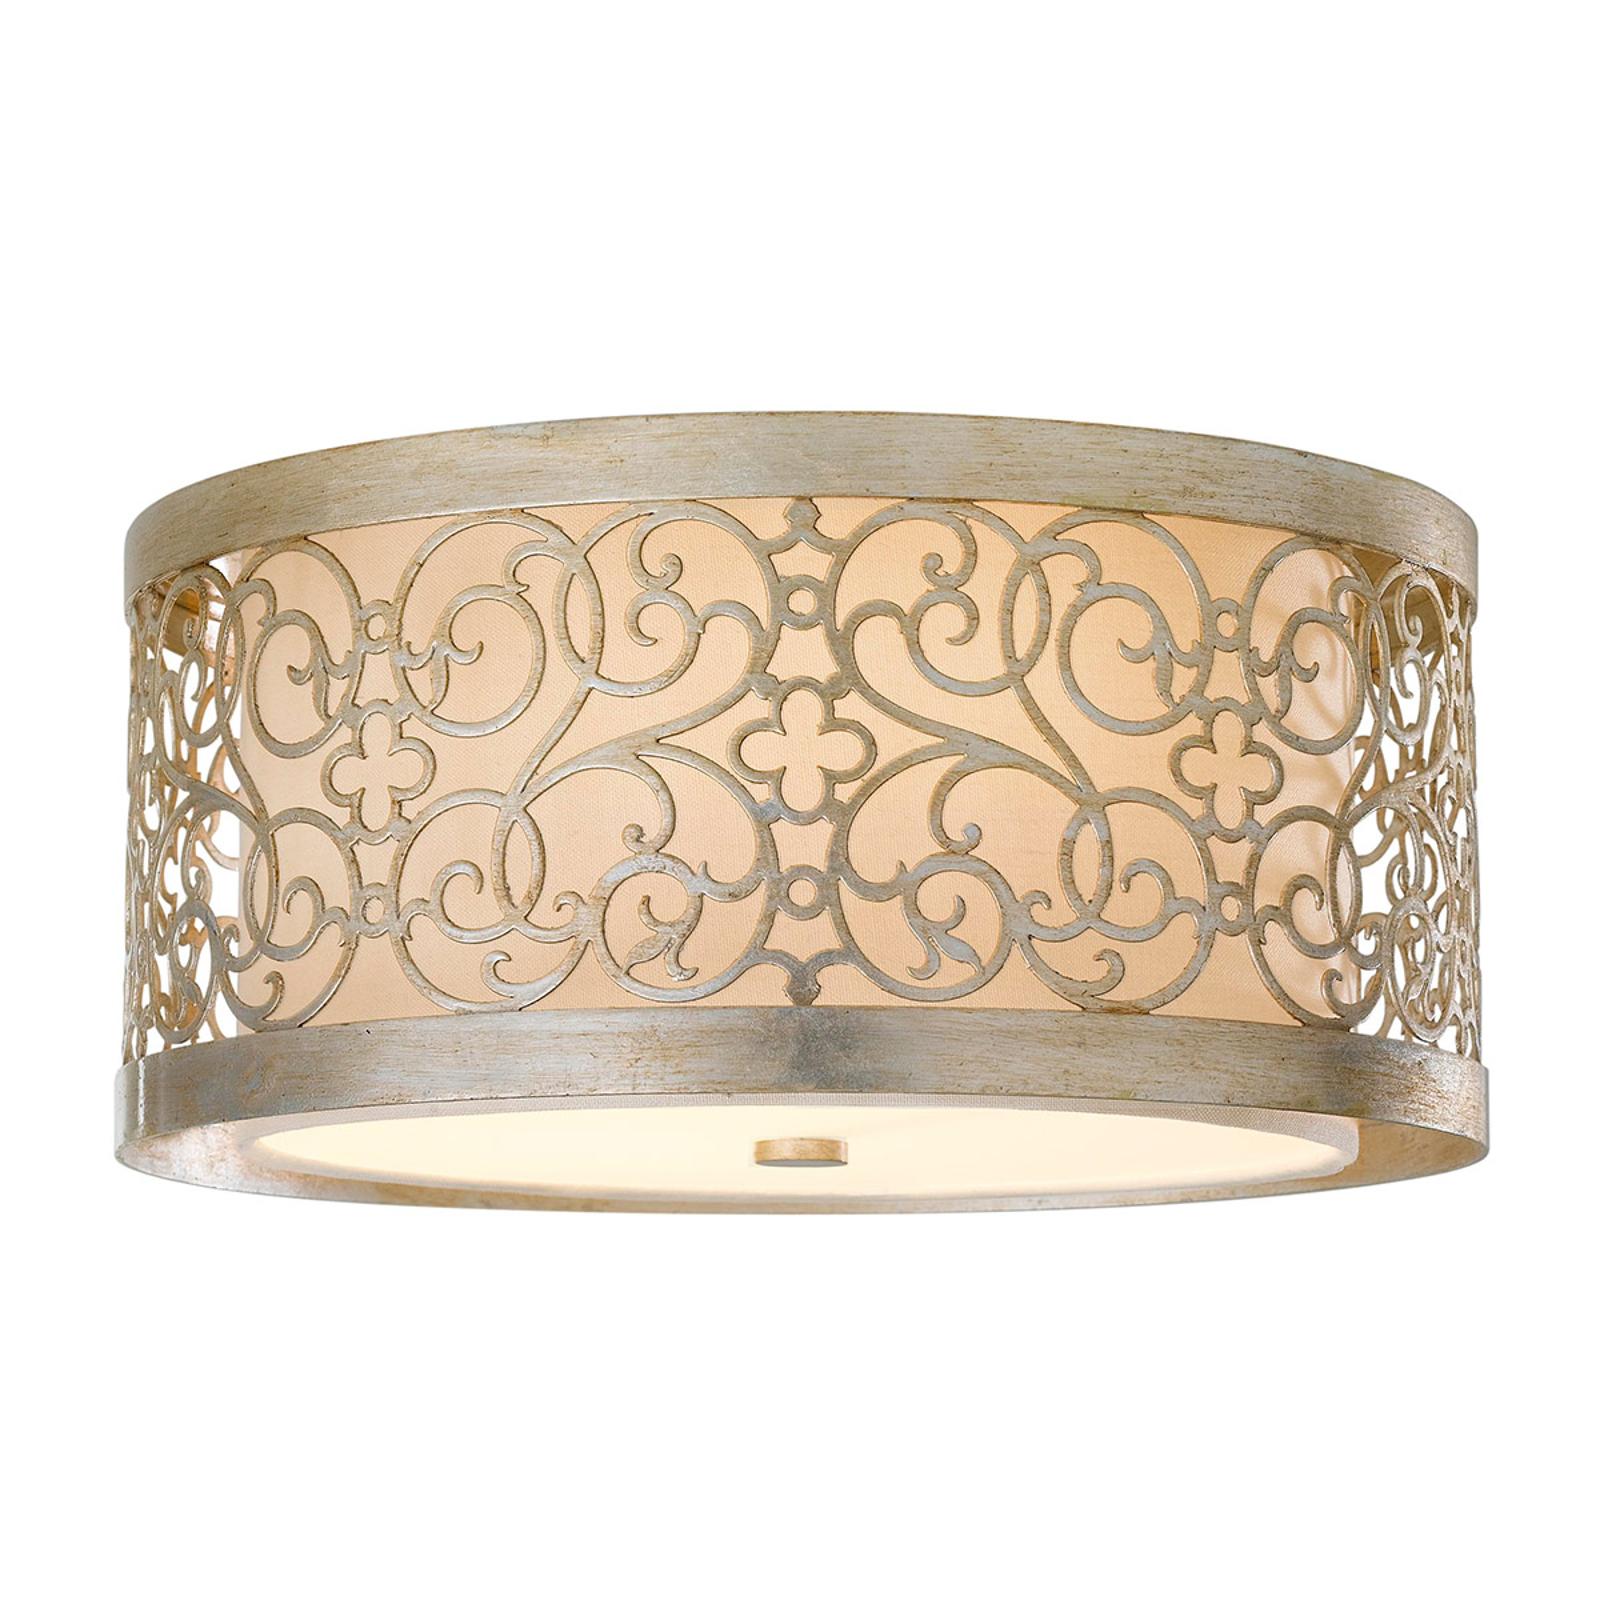 Plafondlamp Arabesque met dubbele kap